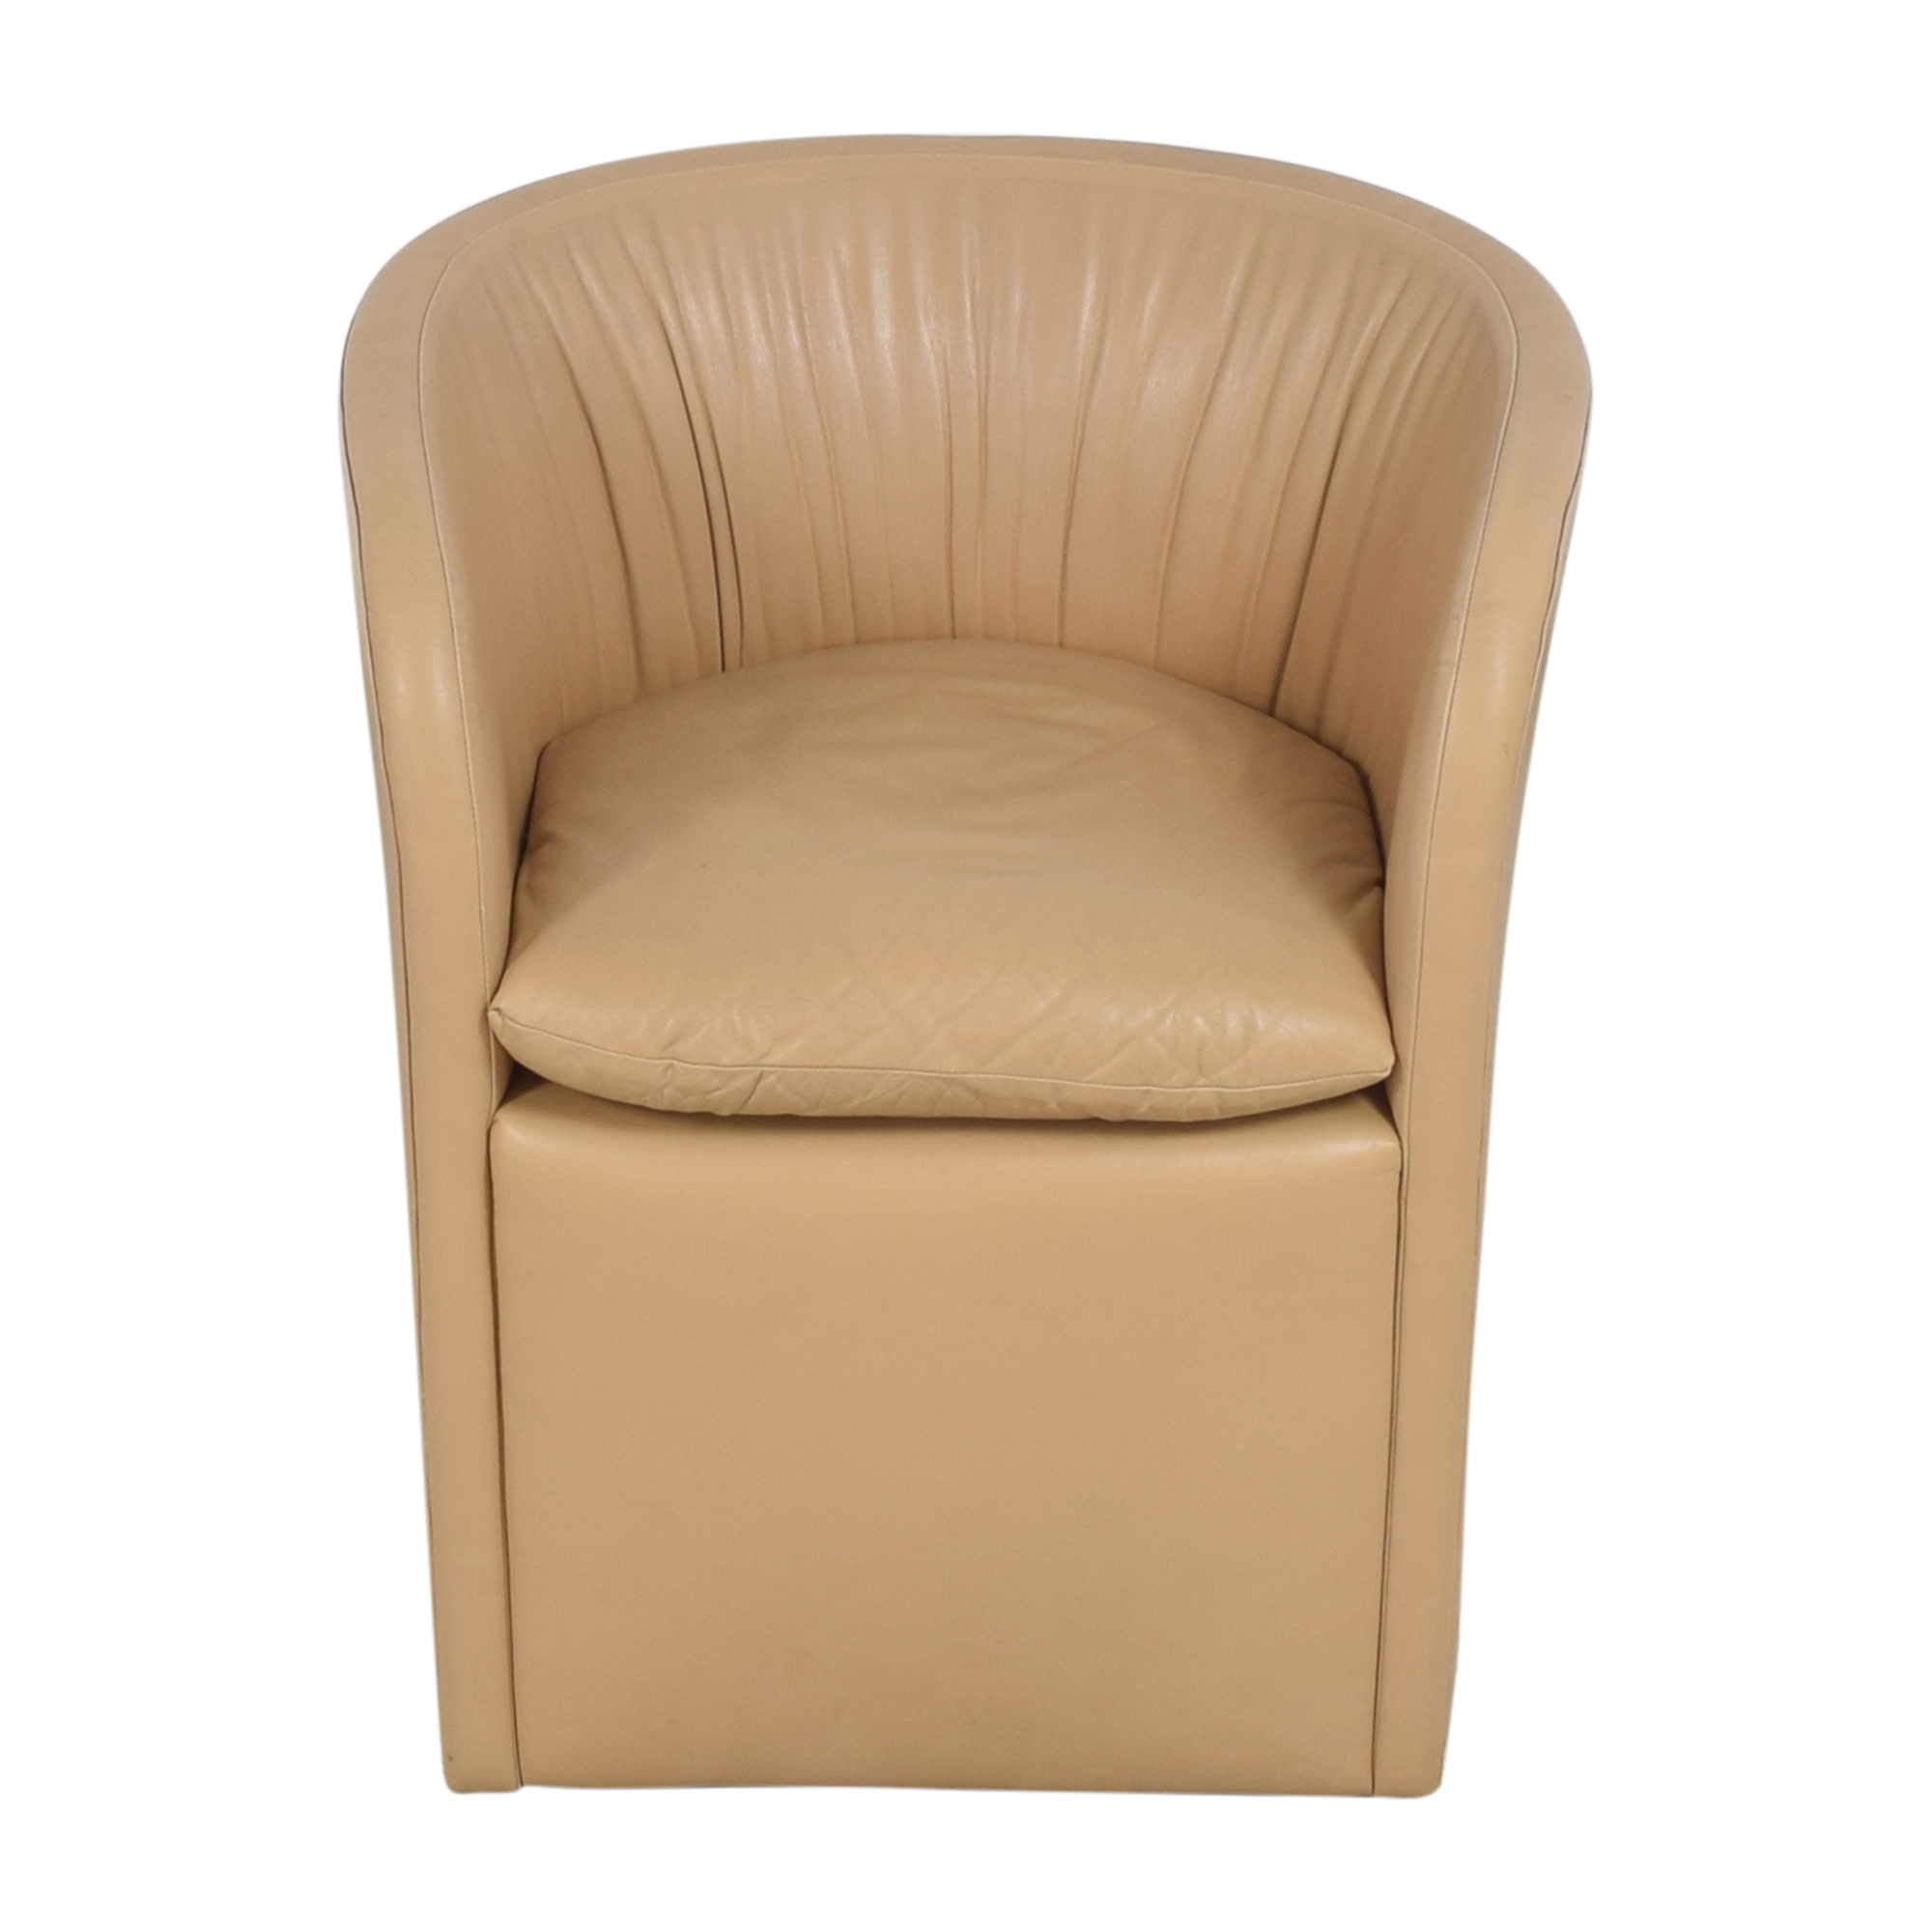 David Edward David Edward by John Saladino Barrel Chair coupon